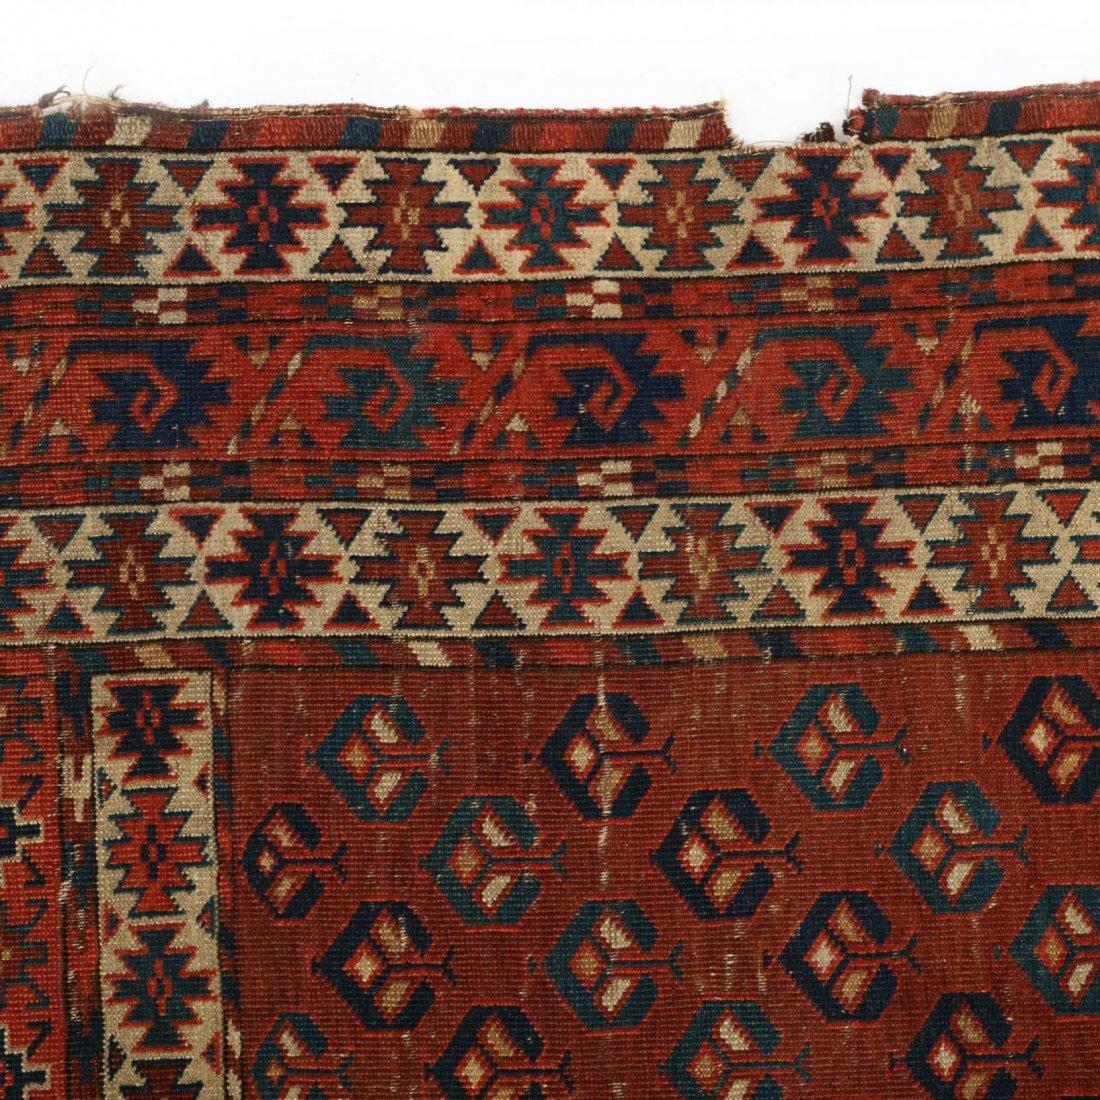 Semi Antique Turkoman Yomut Rug - 4